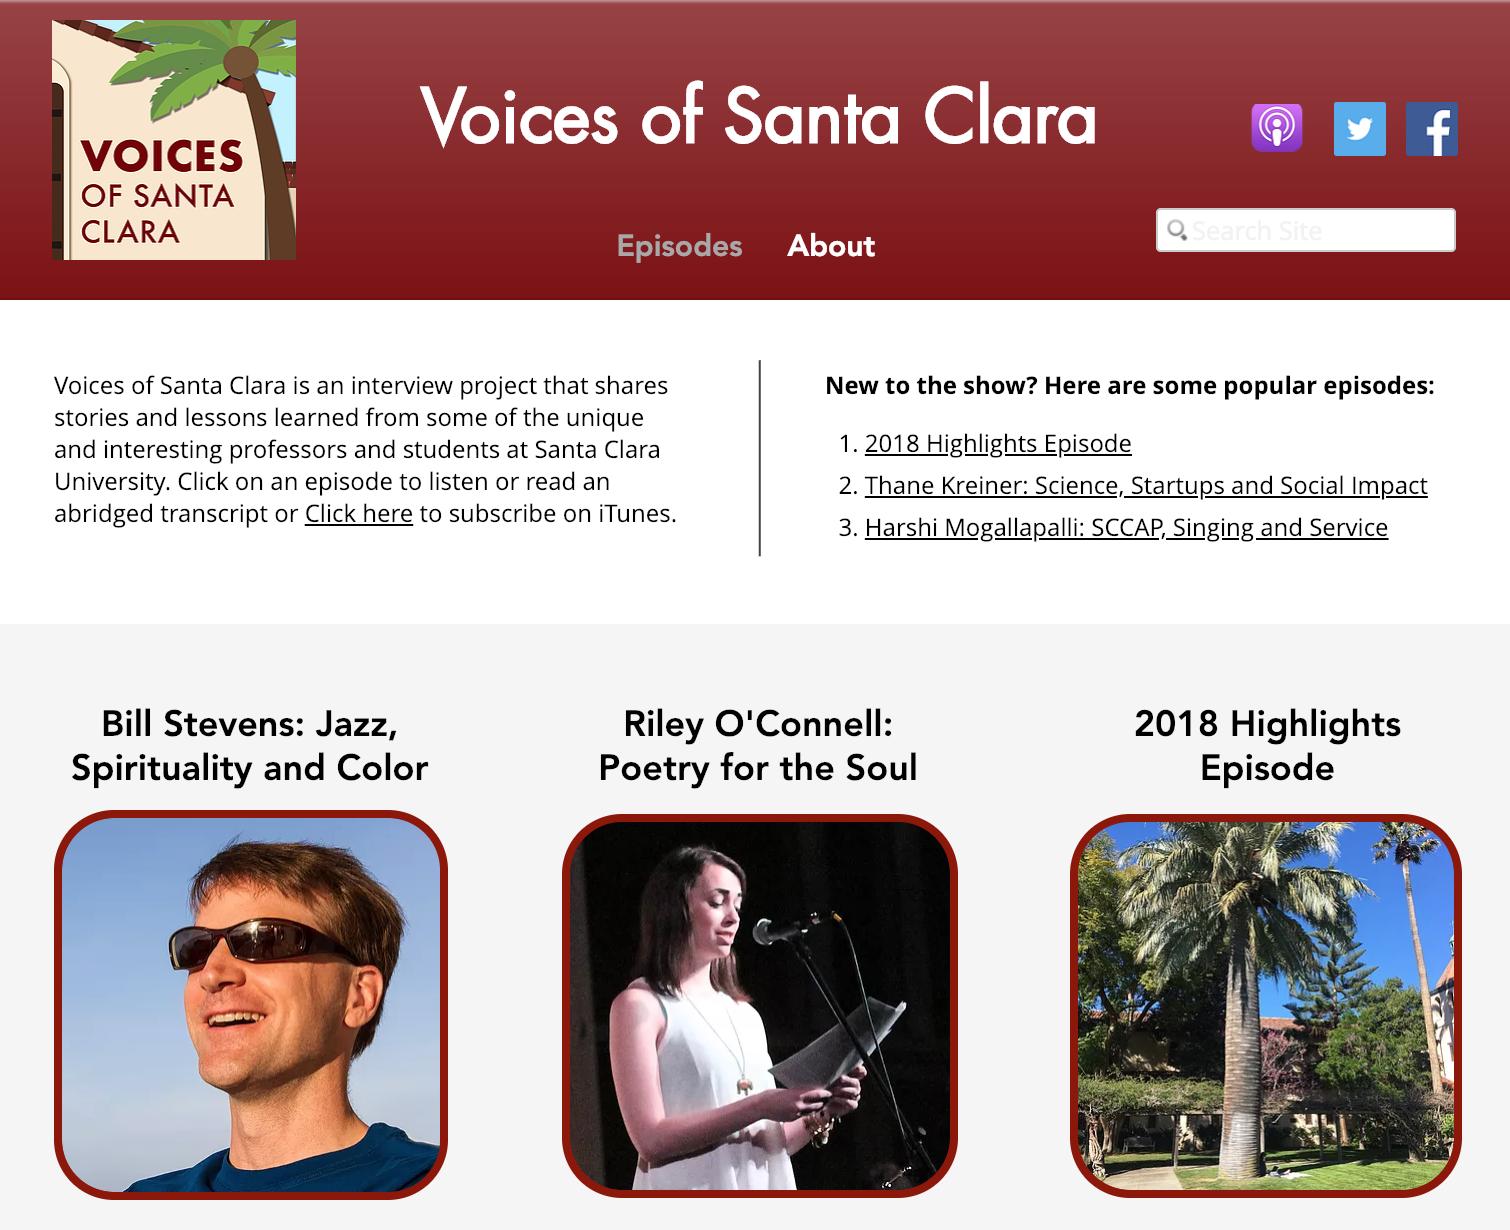 Voices of santa clara homepage